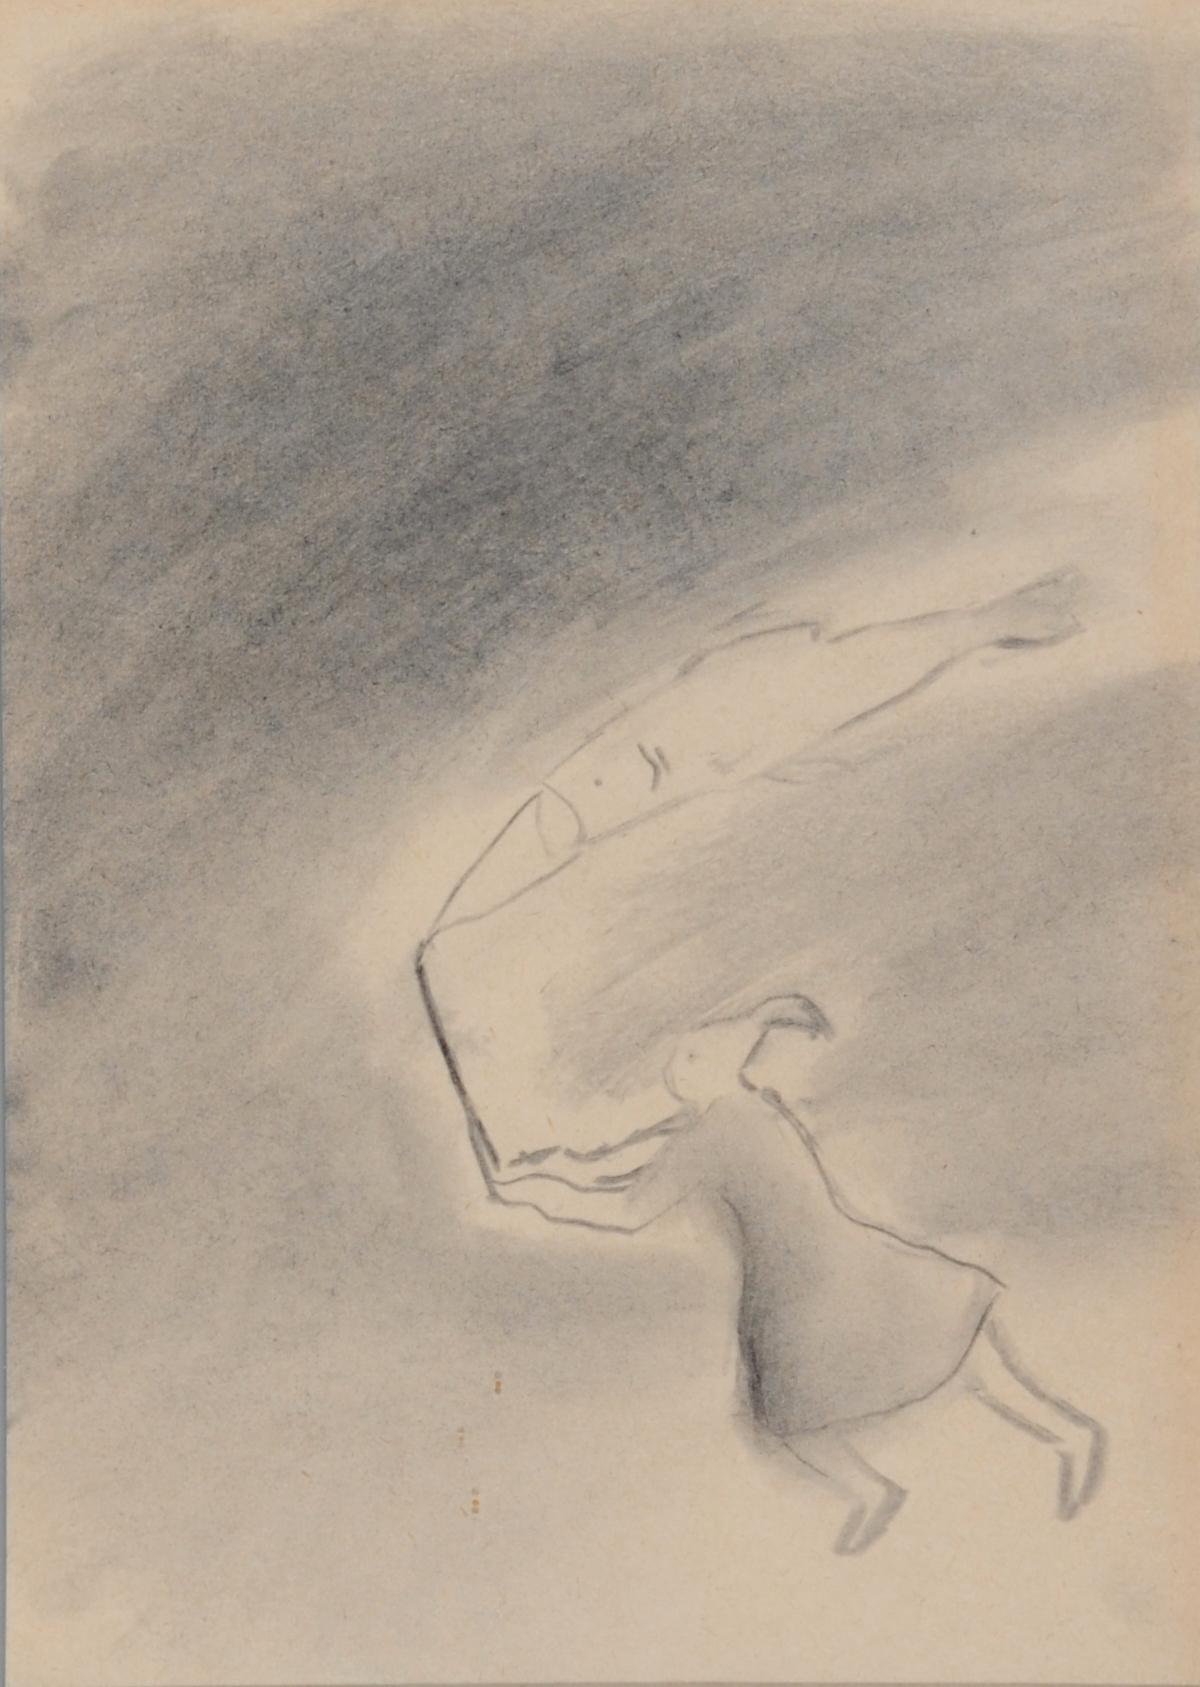 Ikemura Leiko, Untitled